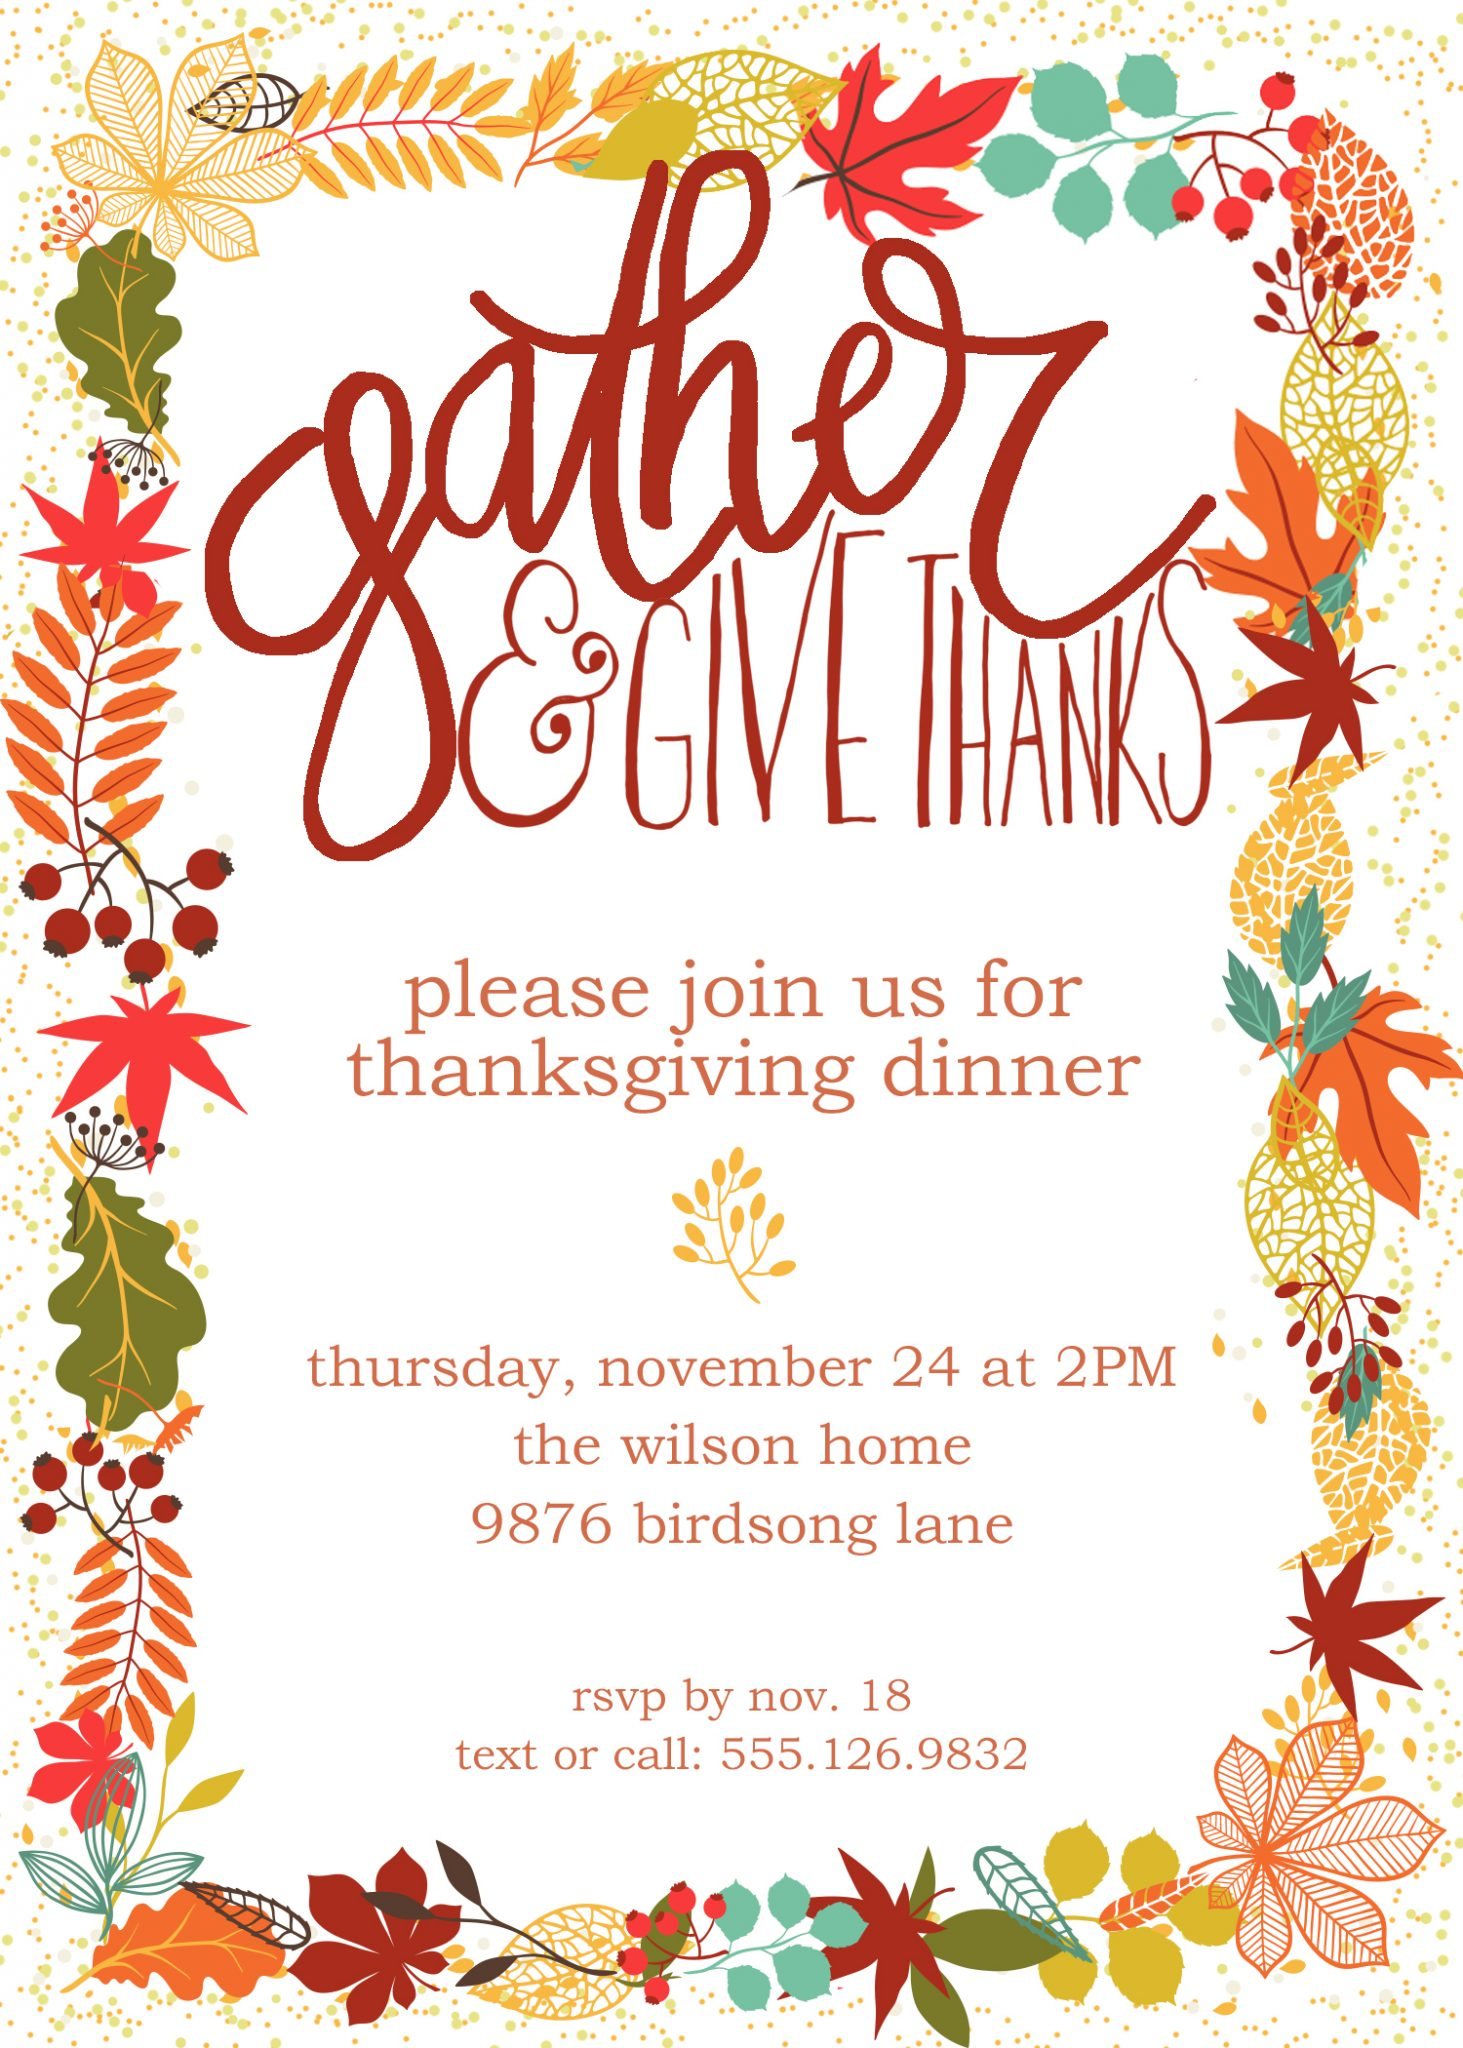 invitations for thanksgiving